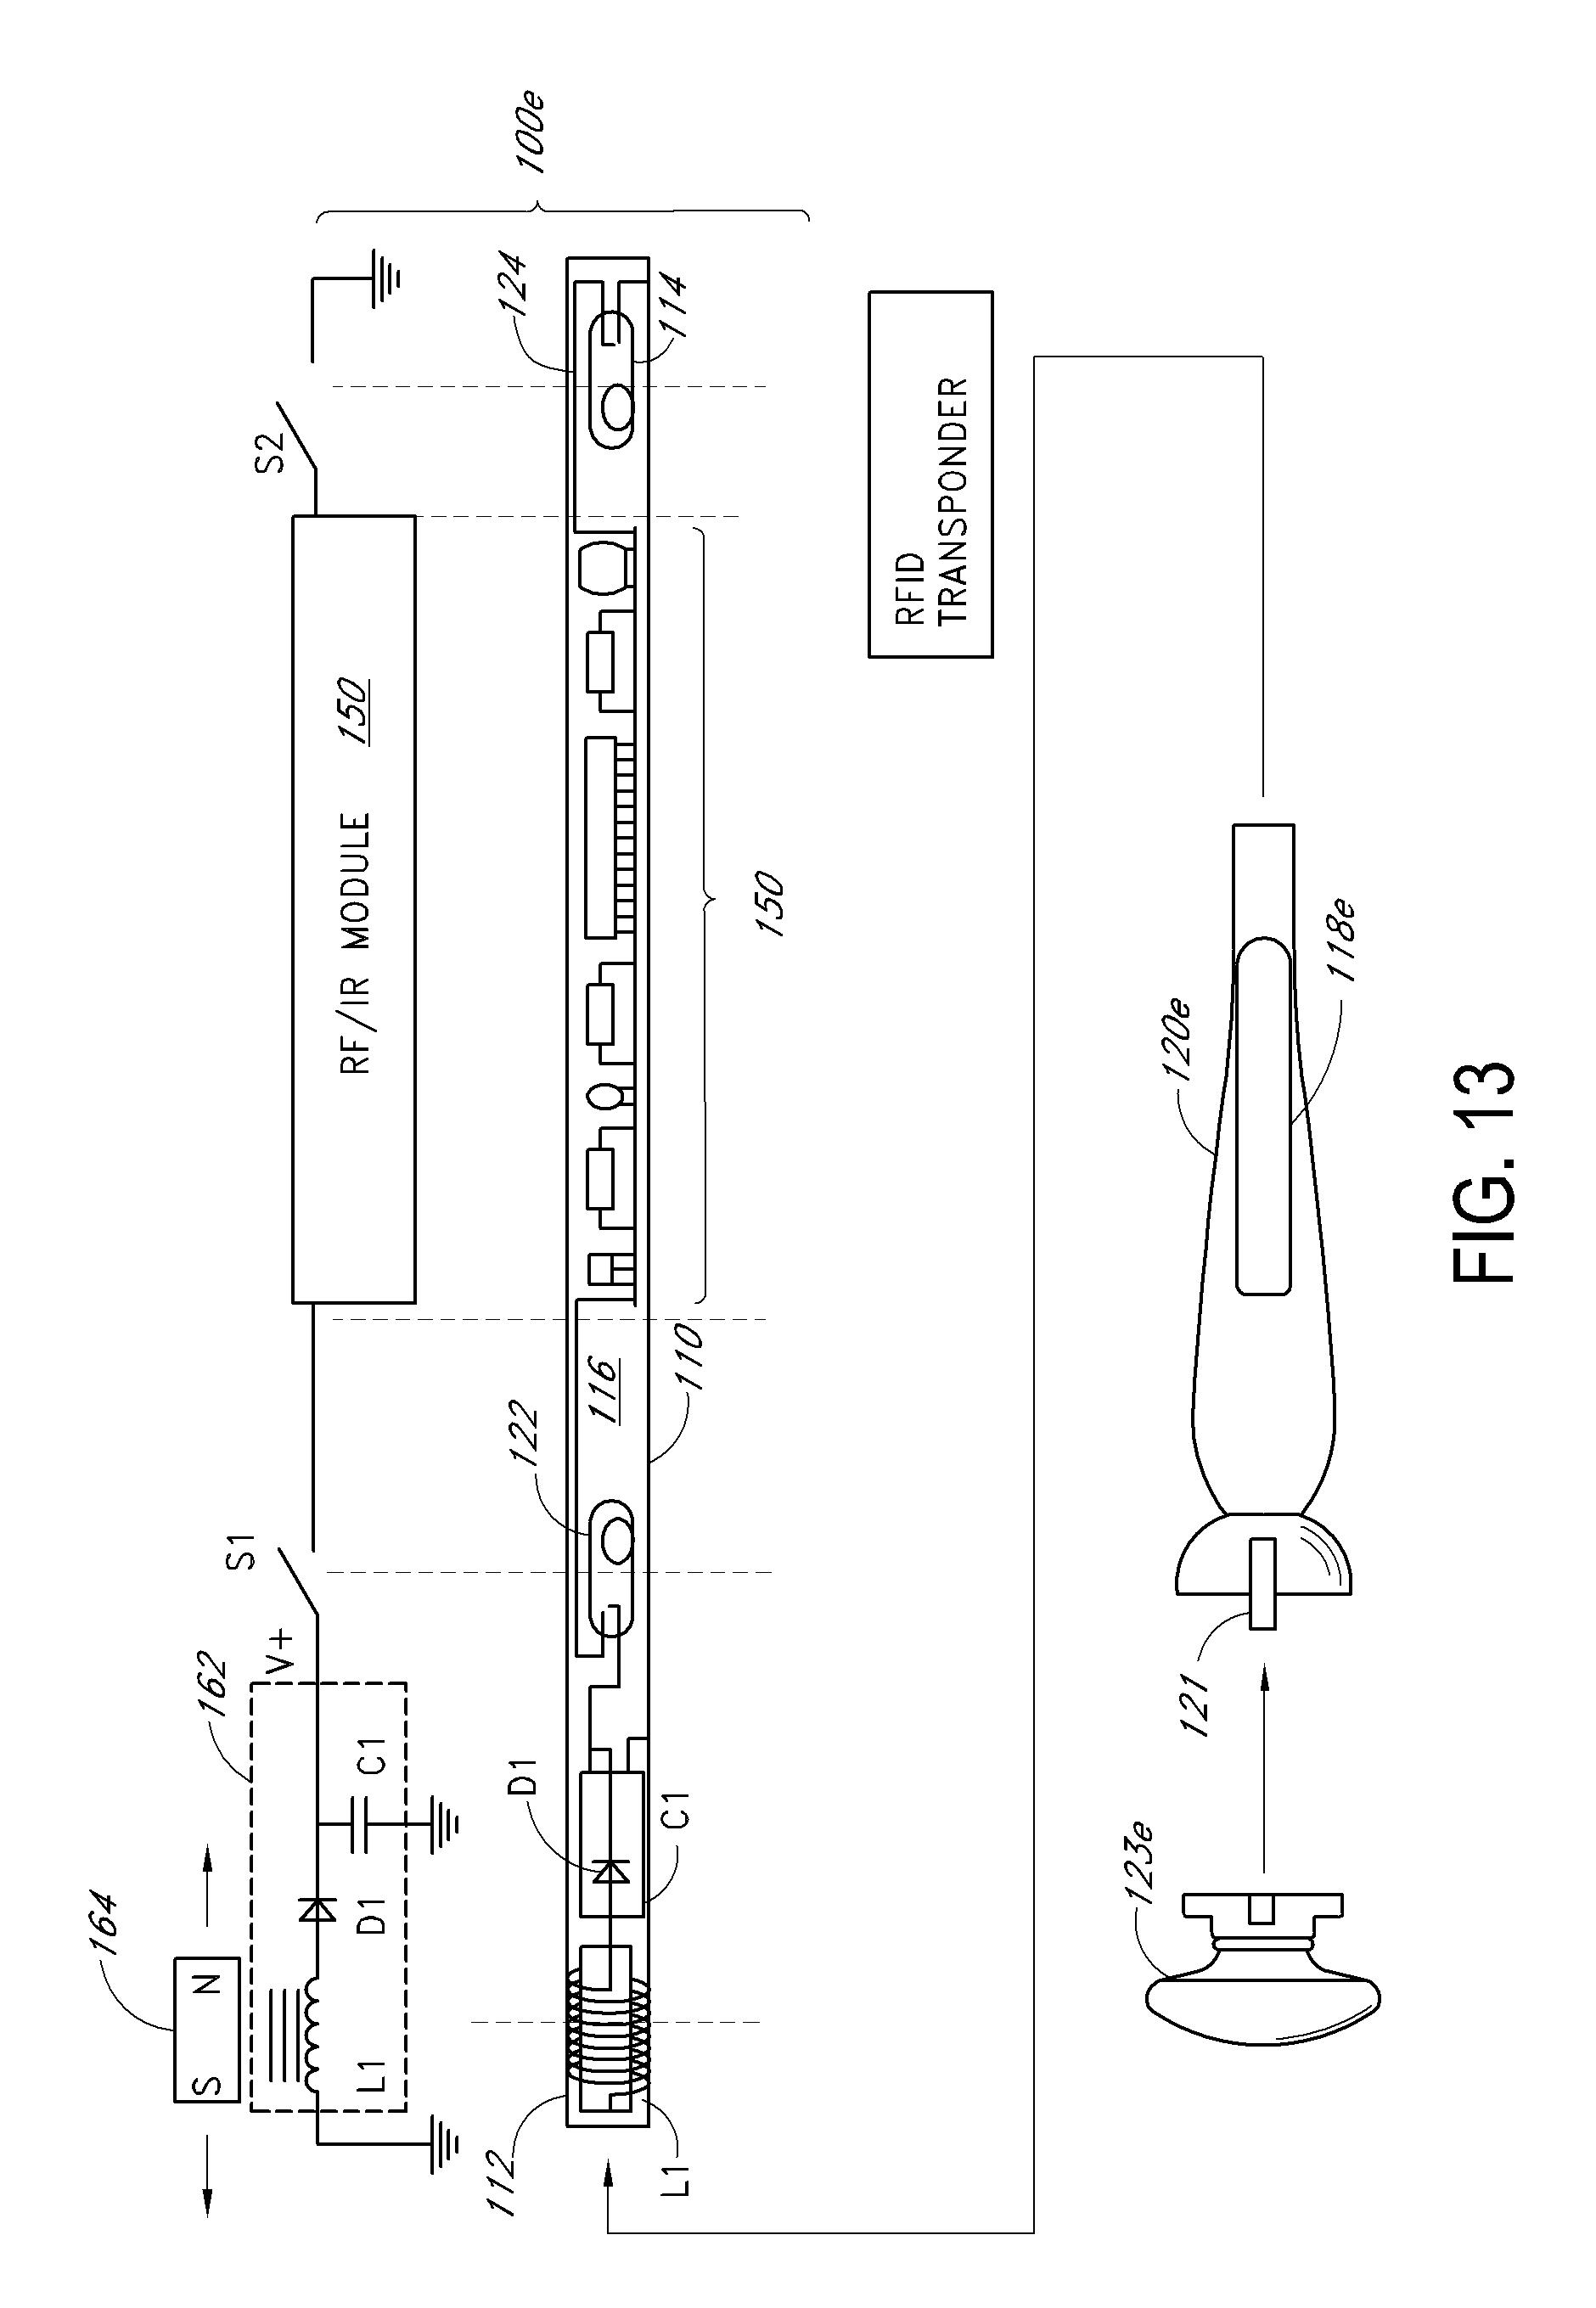 Patent Us 9814973 B2 1996 150 Hp Evenrude Hose Diagrams